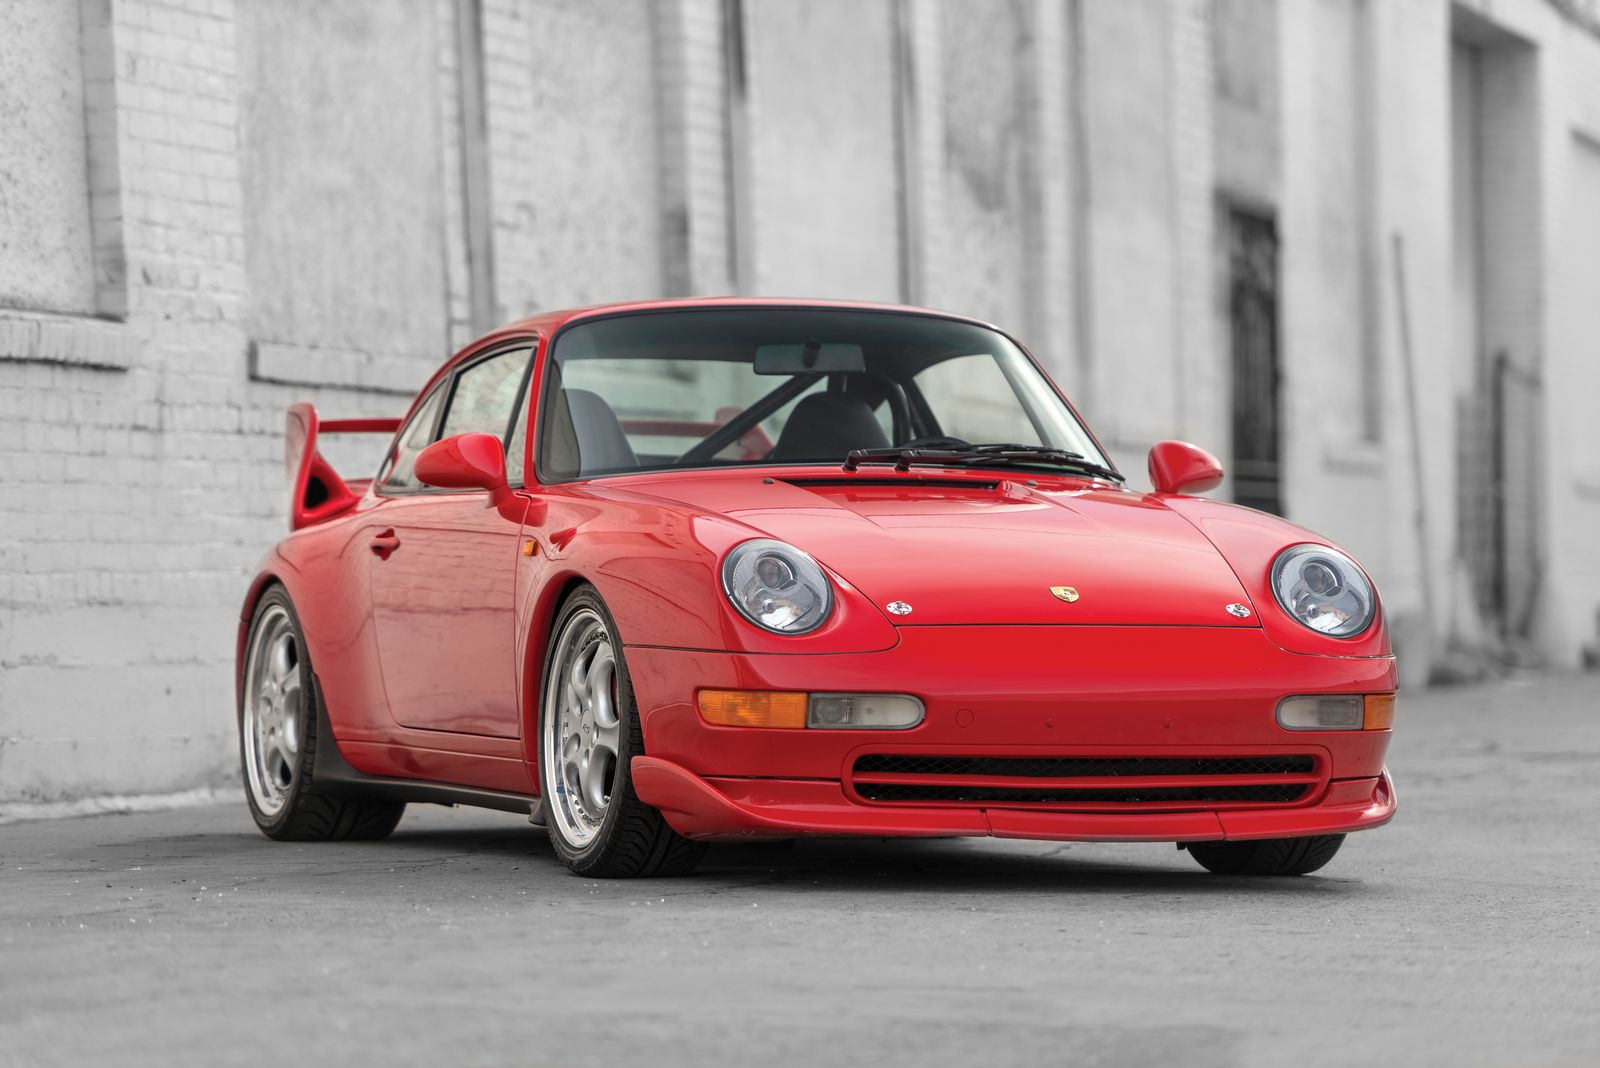 1996 Porsche 911 Carrera Rs 3 8 Could Fetch 450k At Auction Gtspirit